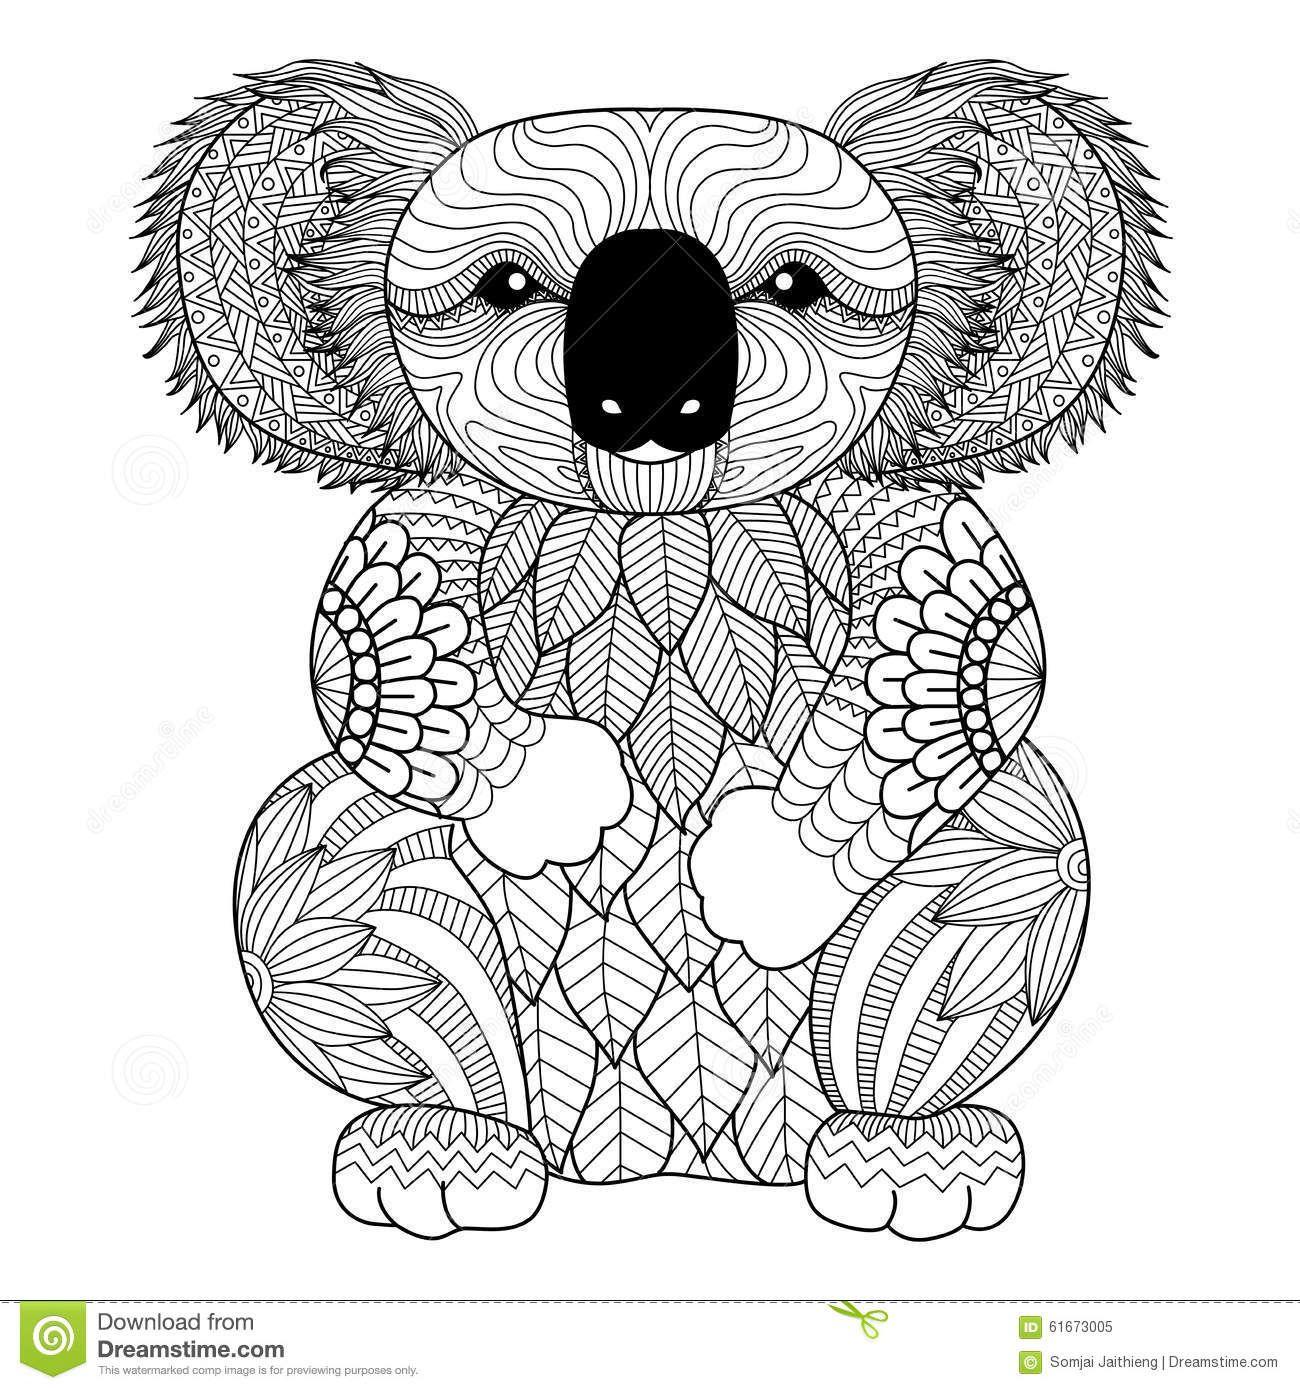 koala ausmalbild  kinderbilderdownload  kinderbilder